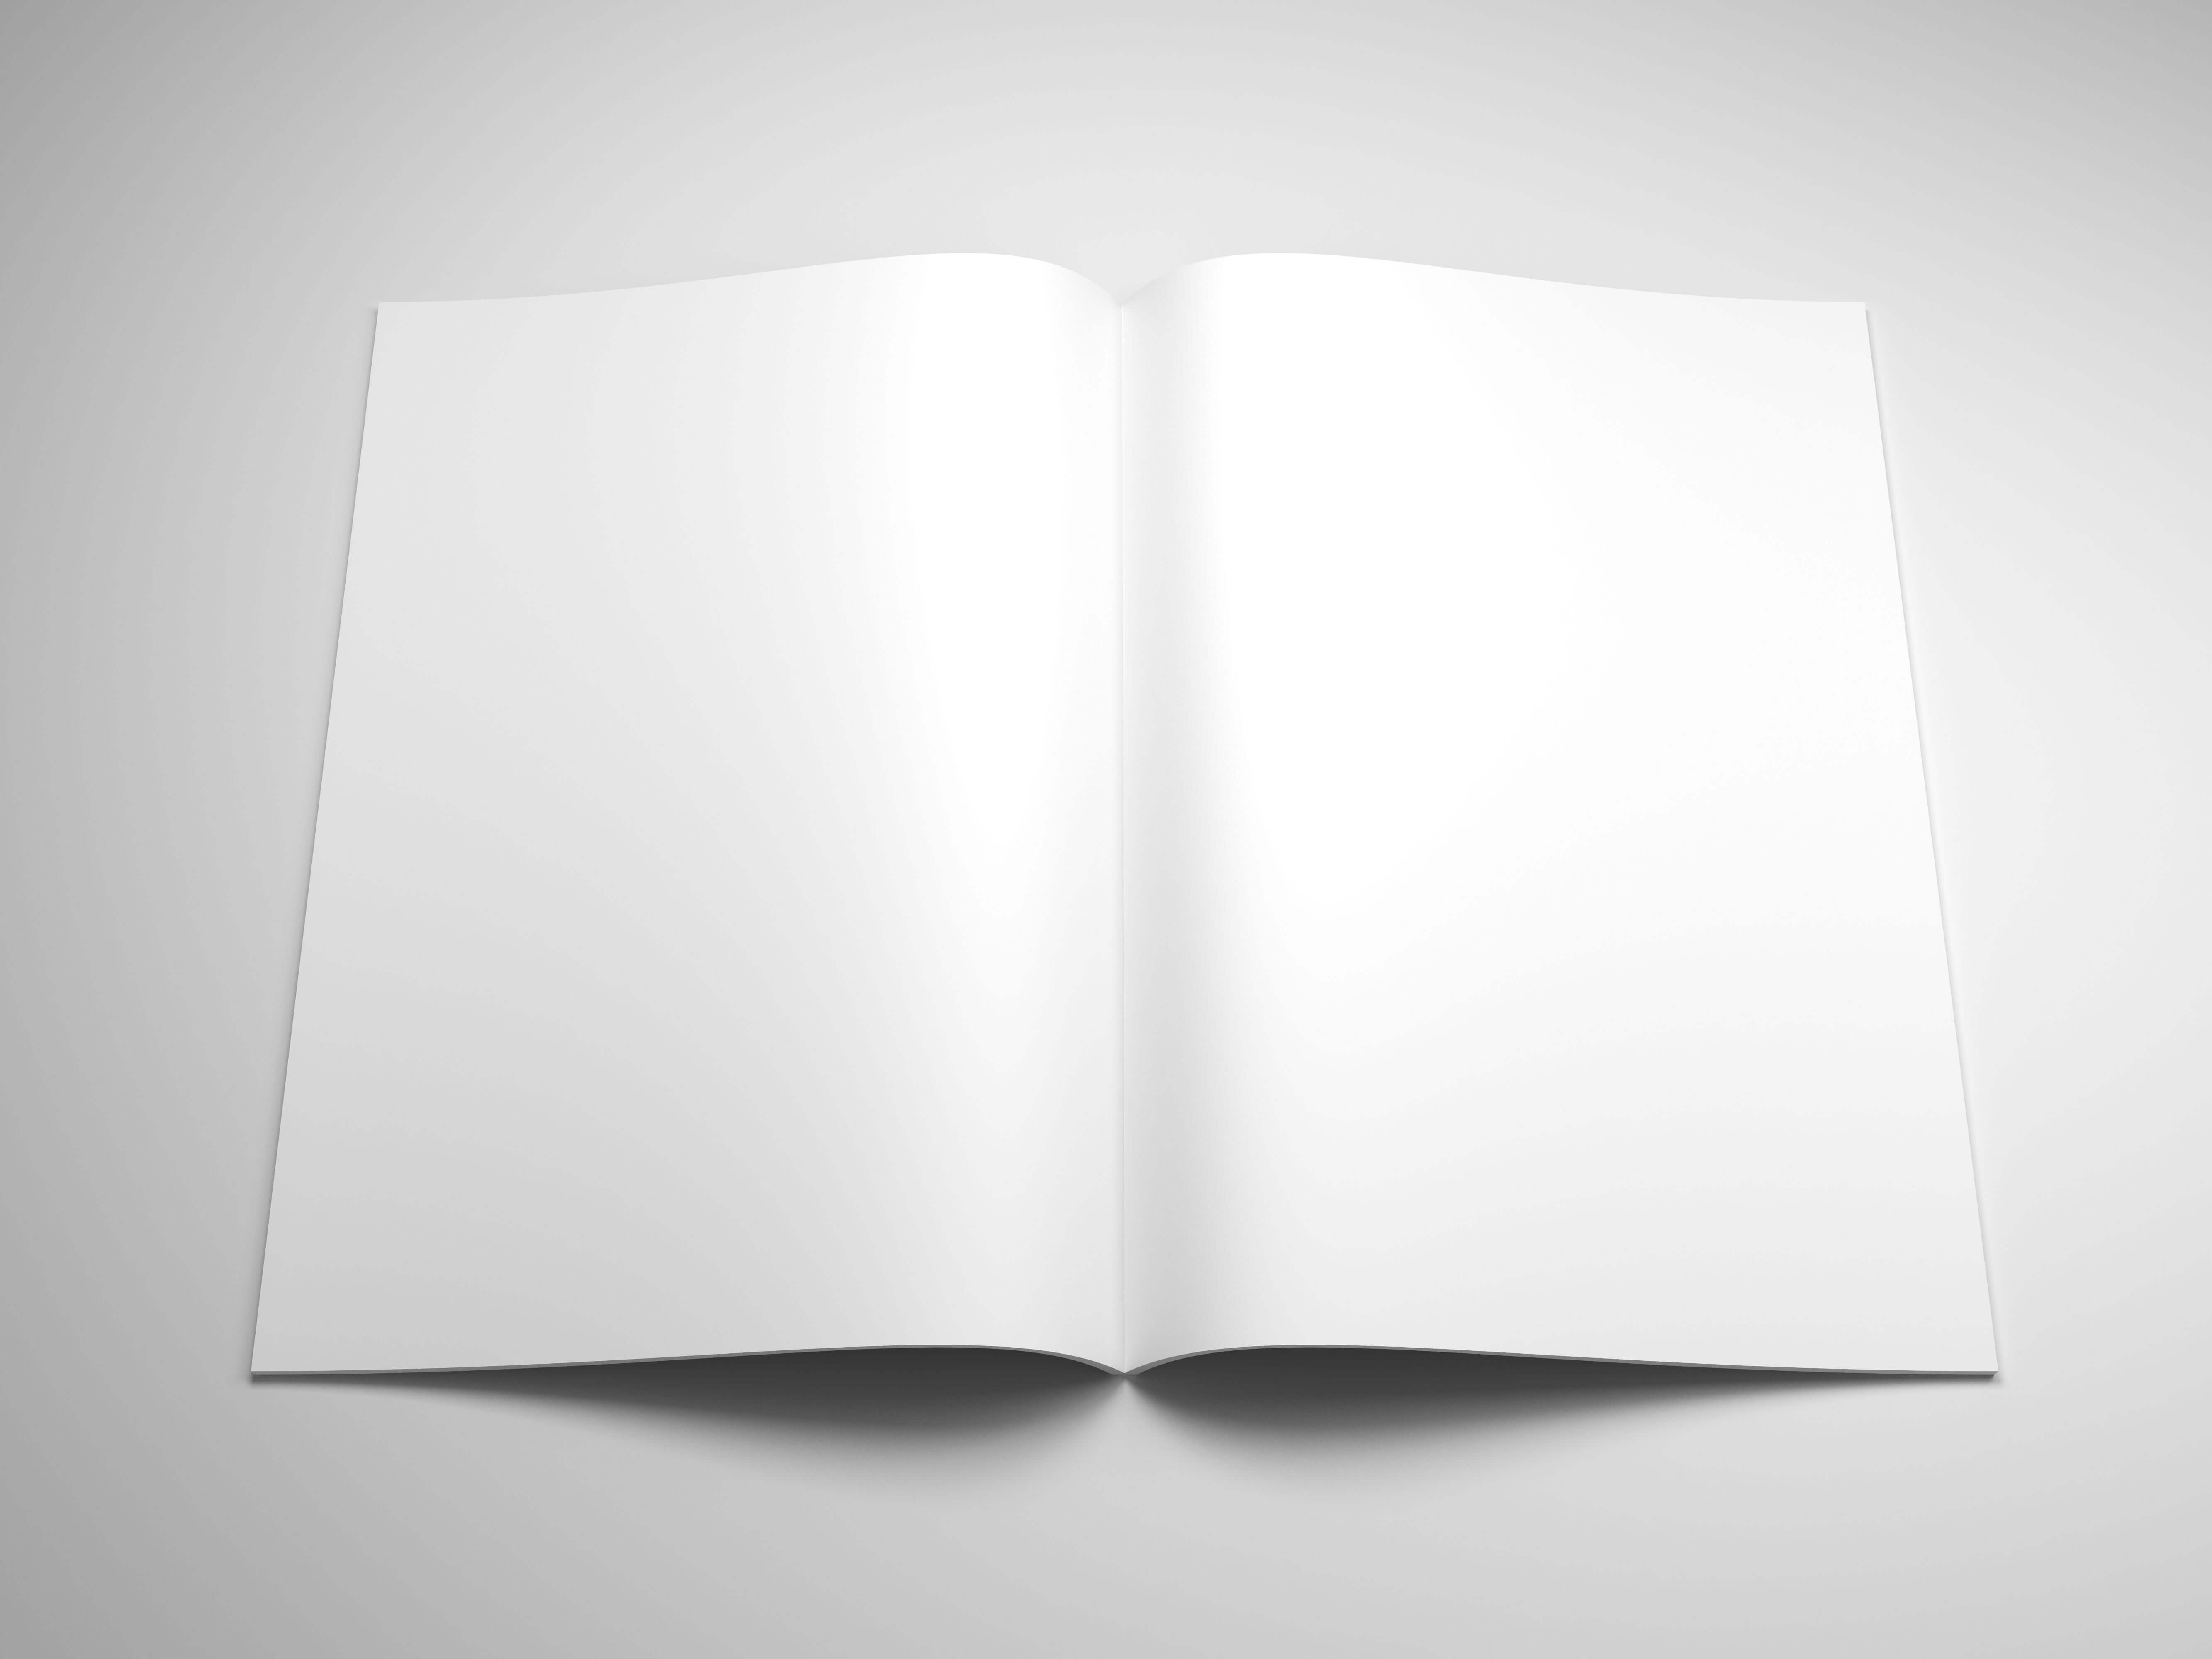 Magazine Spread | Free Resources | Mockup Templates, Mockup Intended For Blank Magazine Template Psd